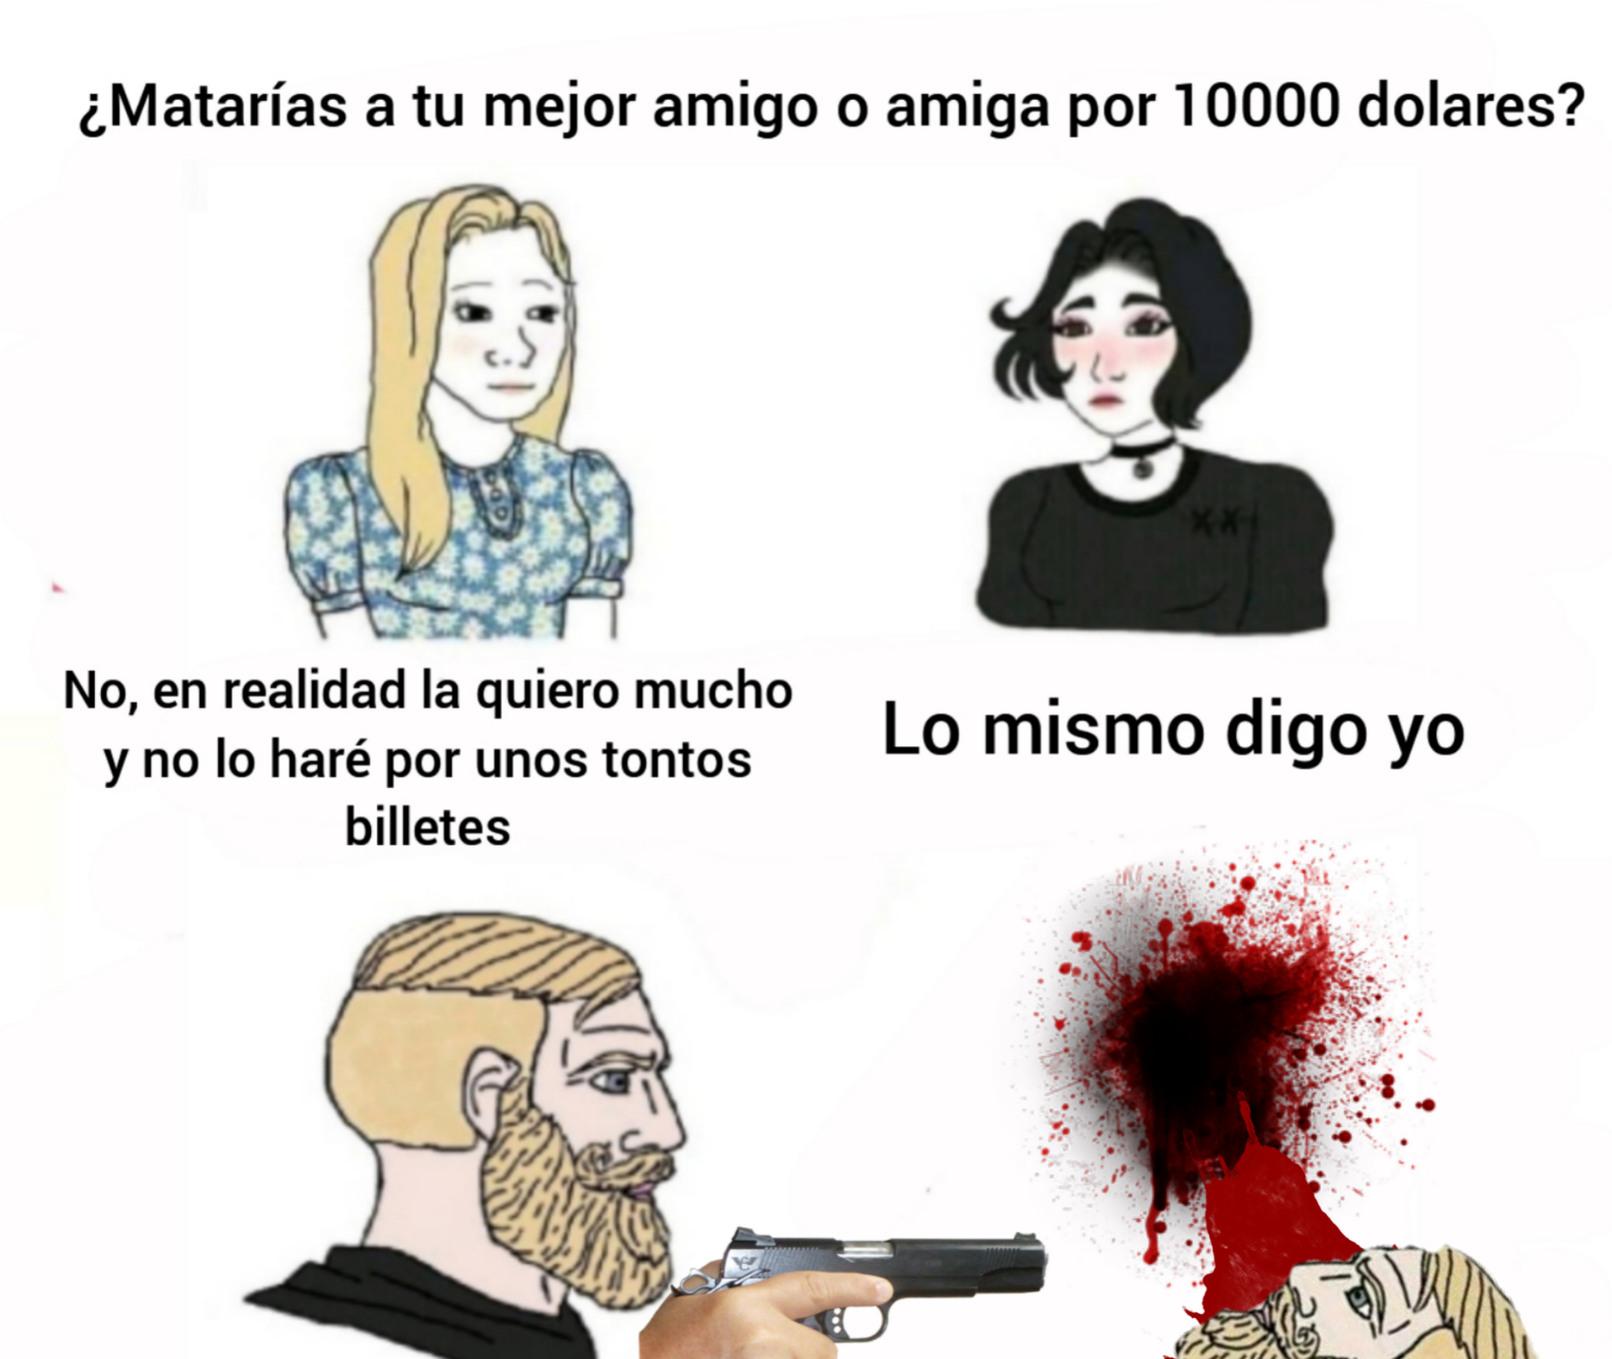 00111010 01110110 - meme